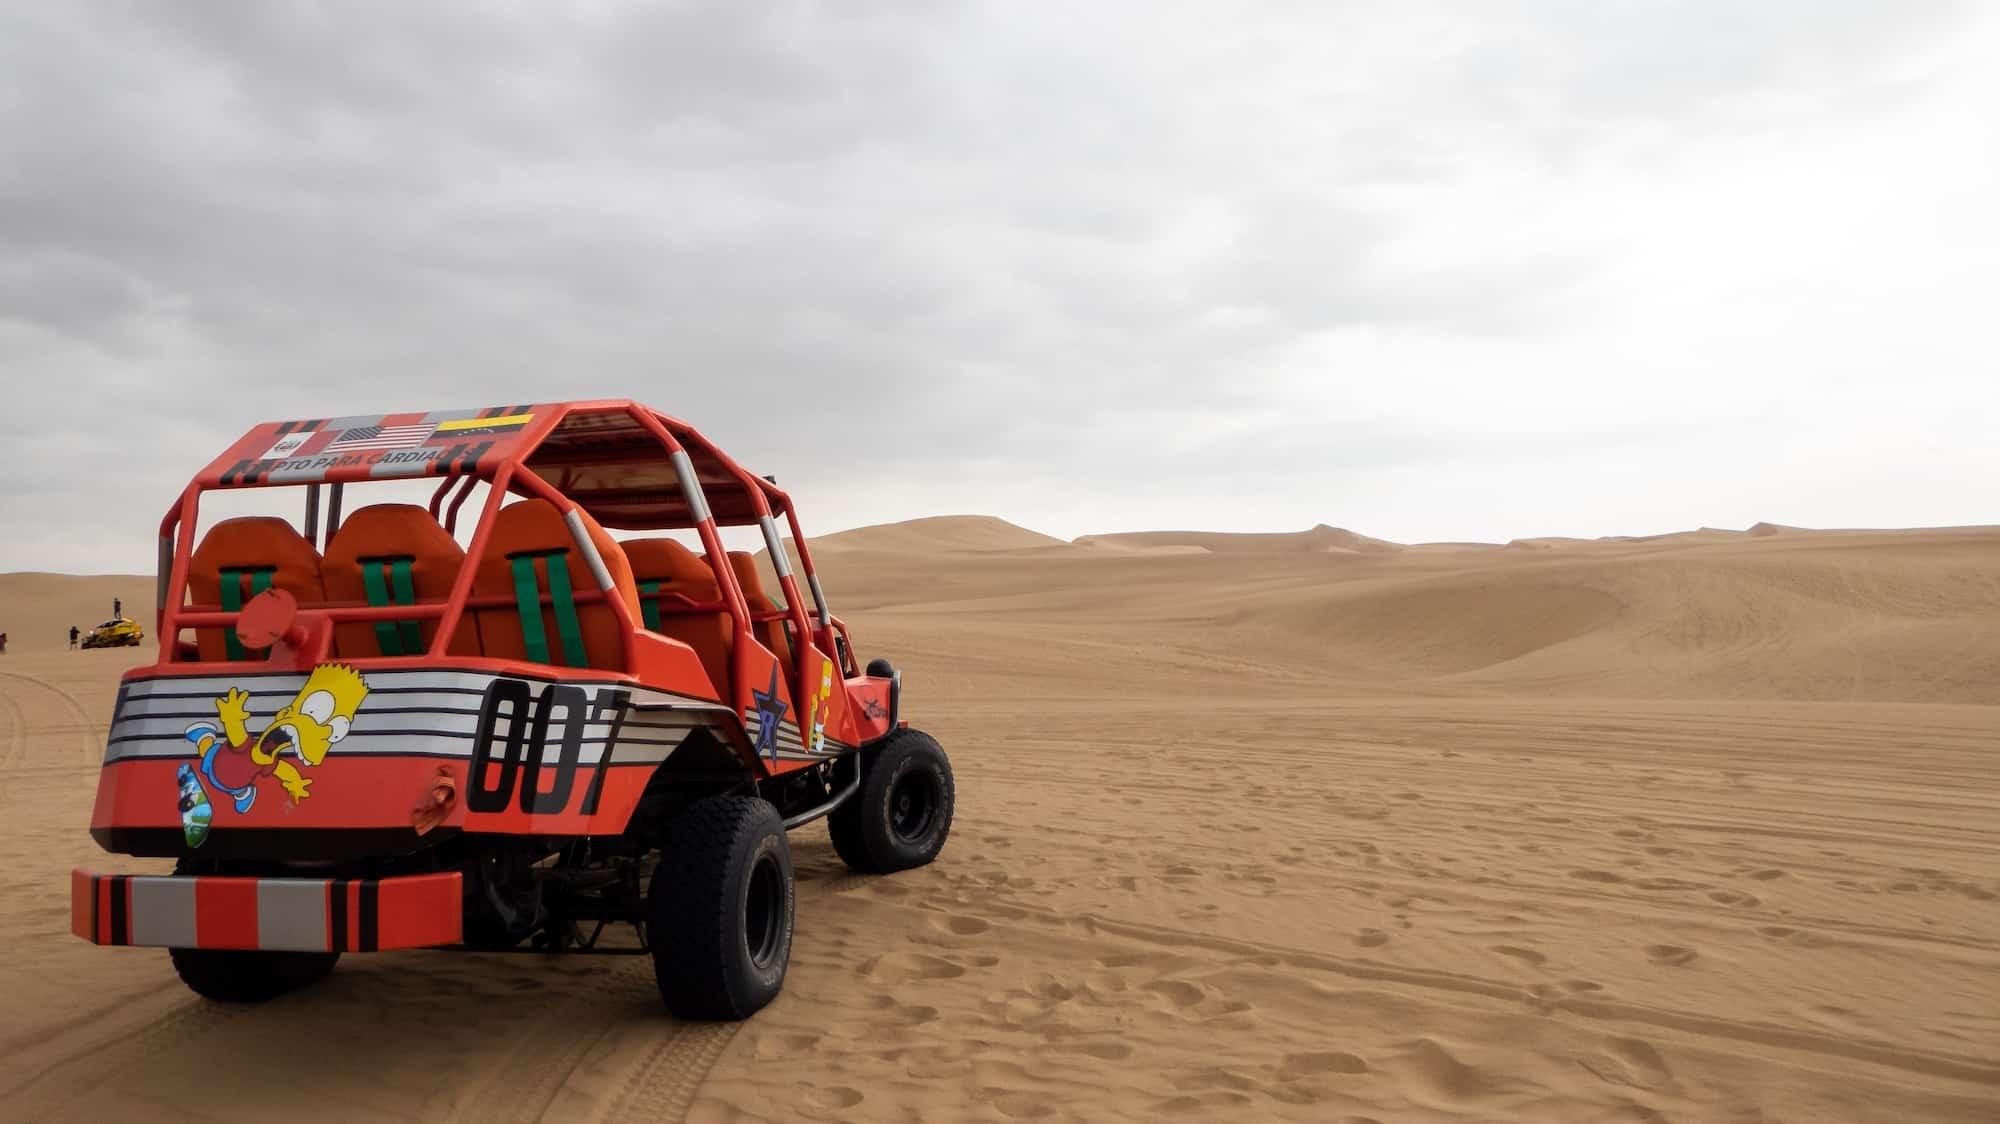 Dune buggy in Huacachina desert- Full Day Ica Tour